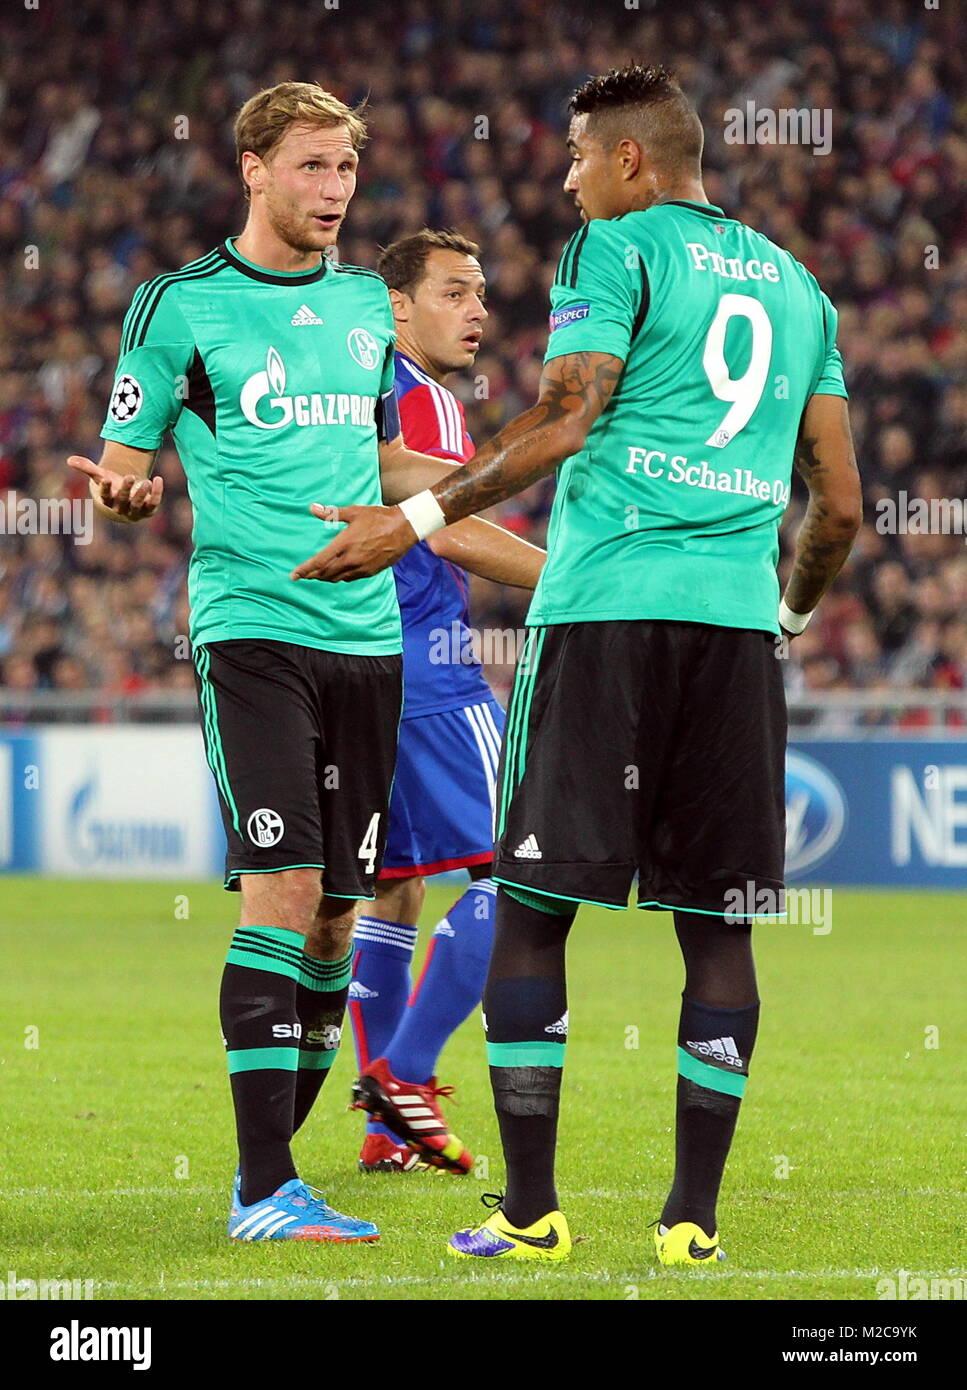 Gesprächsbedarf: Benedikt Höwedes (enlaces) mit Prince Boateng - Fussball-Champions-Liga: 2. Spieltag, FC Basel vs. FC Schalke 04 Foto de stock